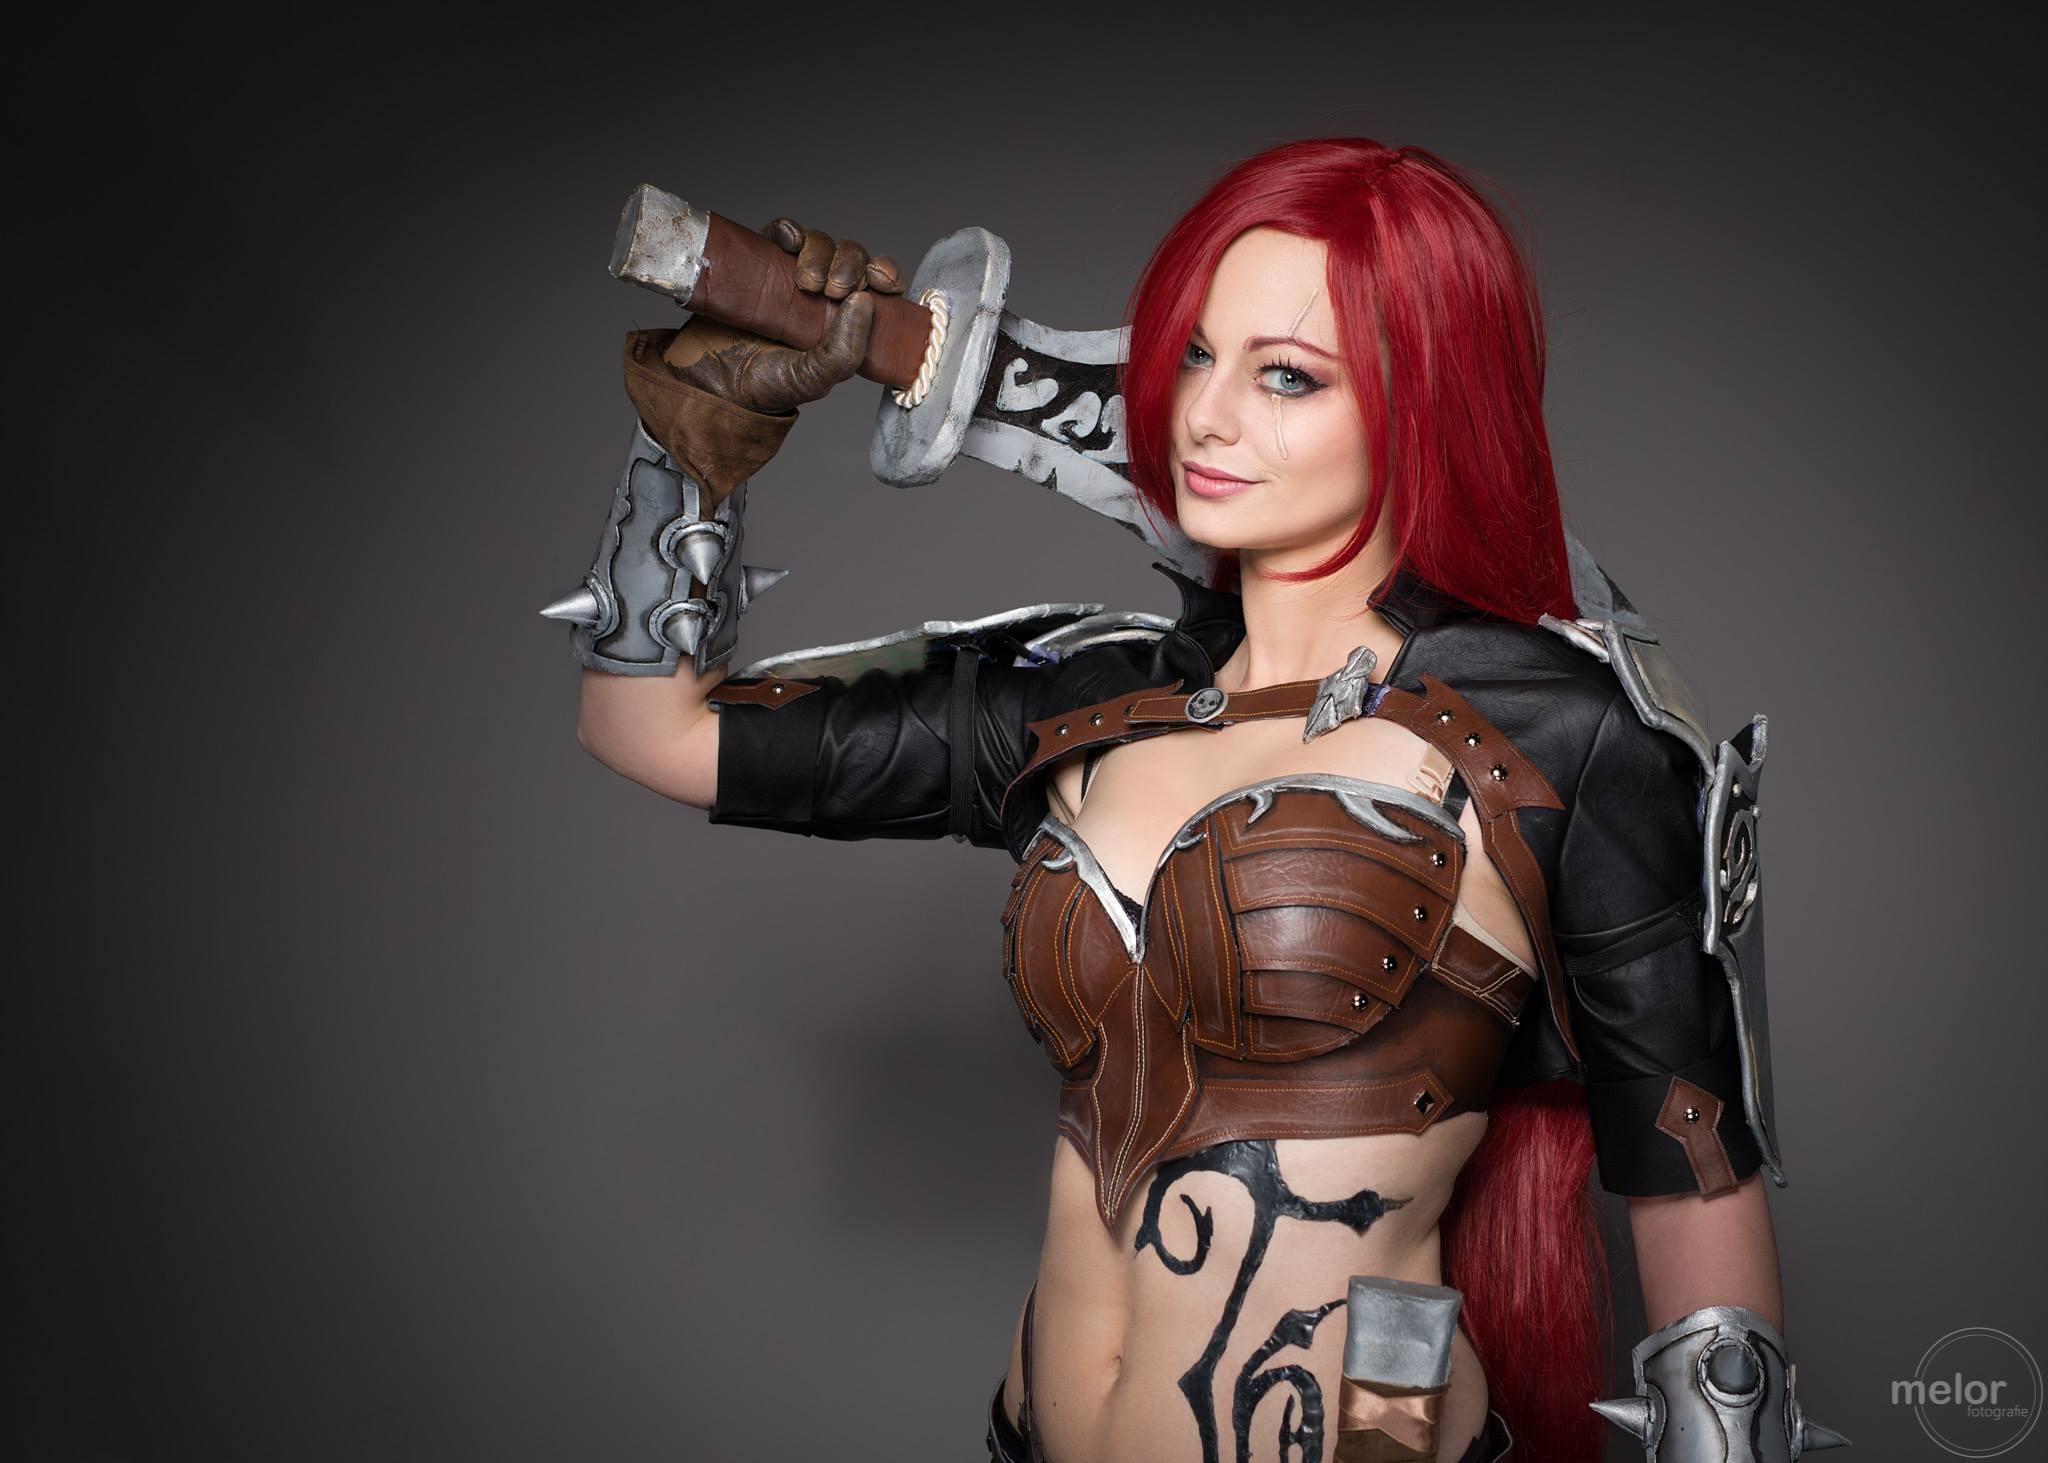 katarina lol cosplay costume by eden craft